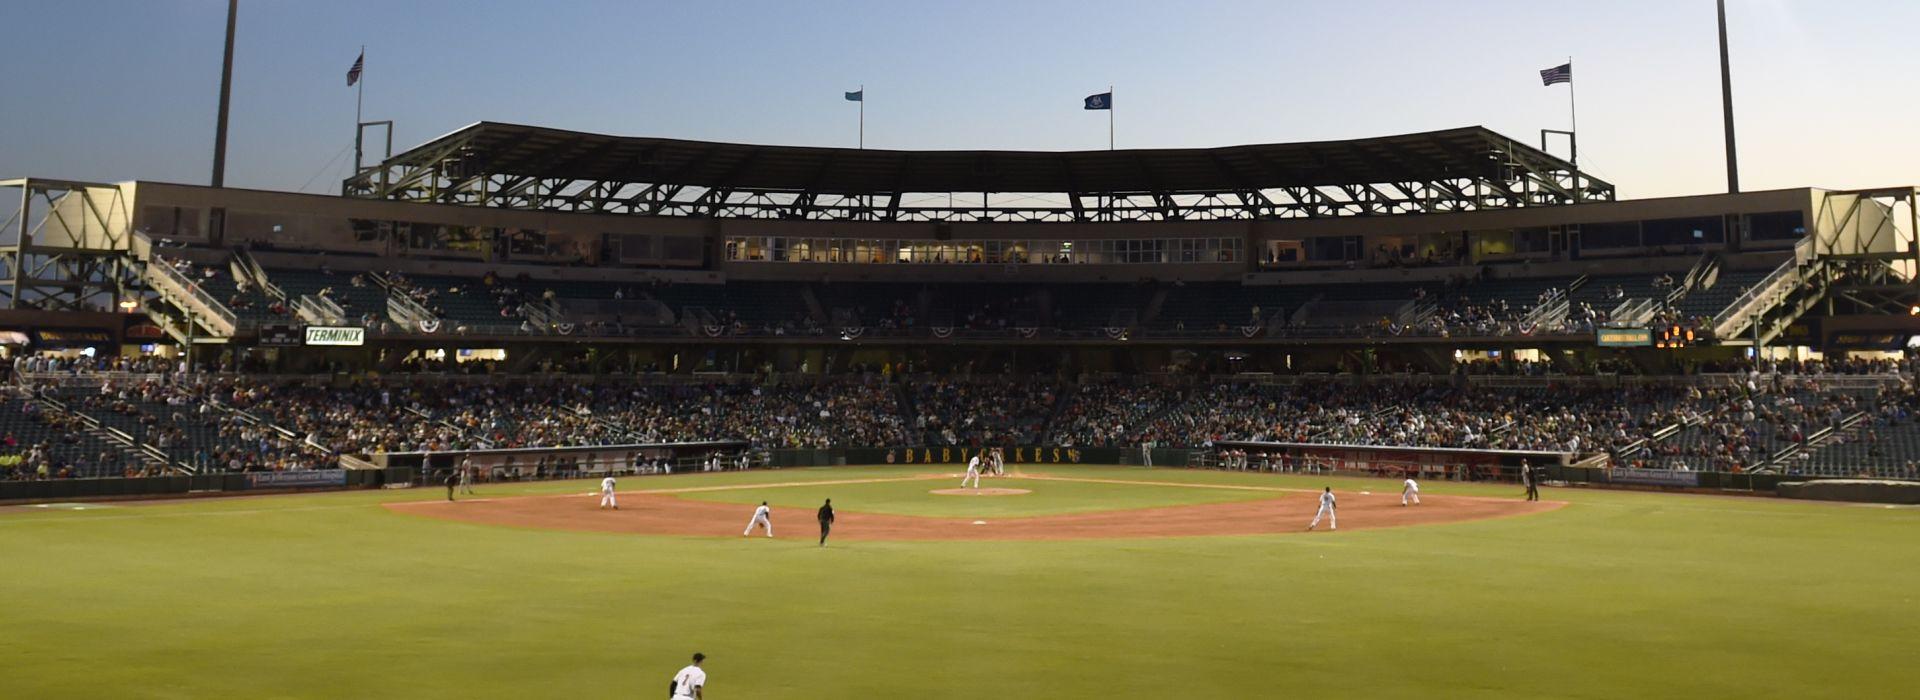 New Orleans BabyCakes baseball